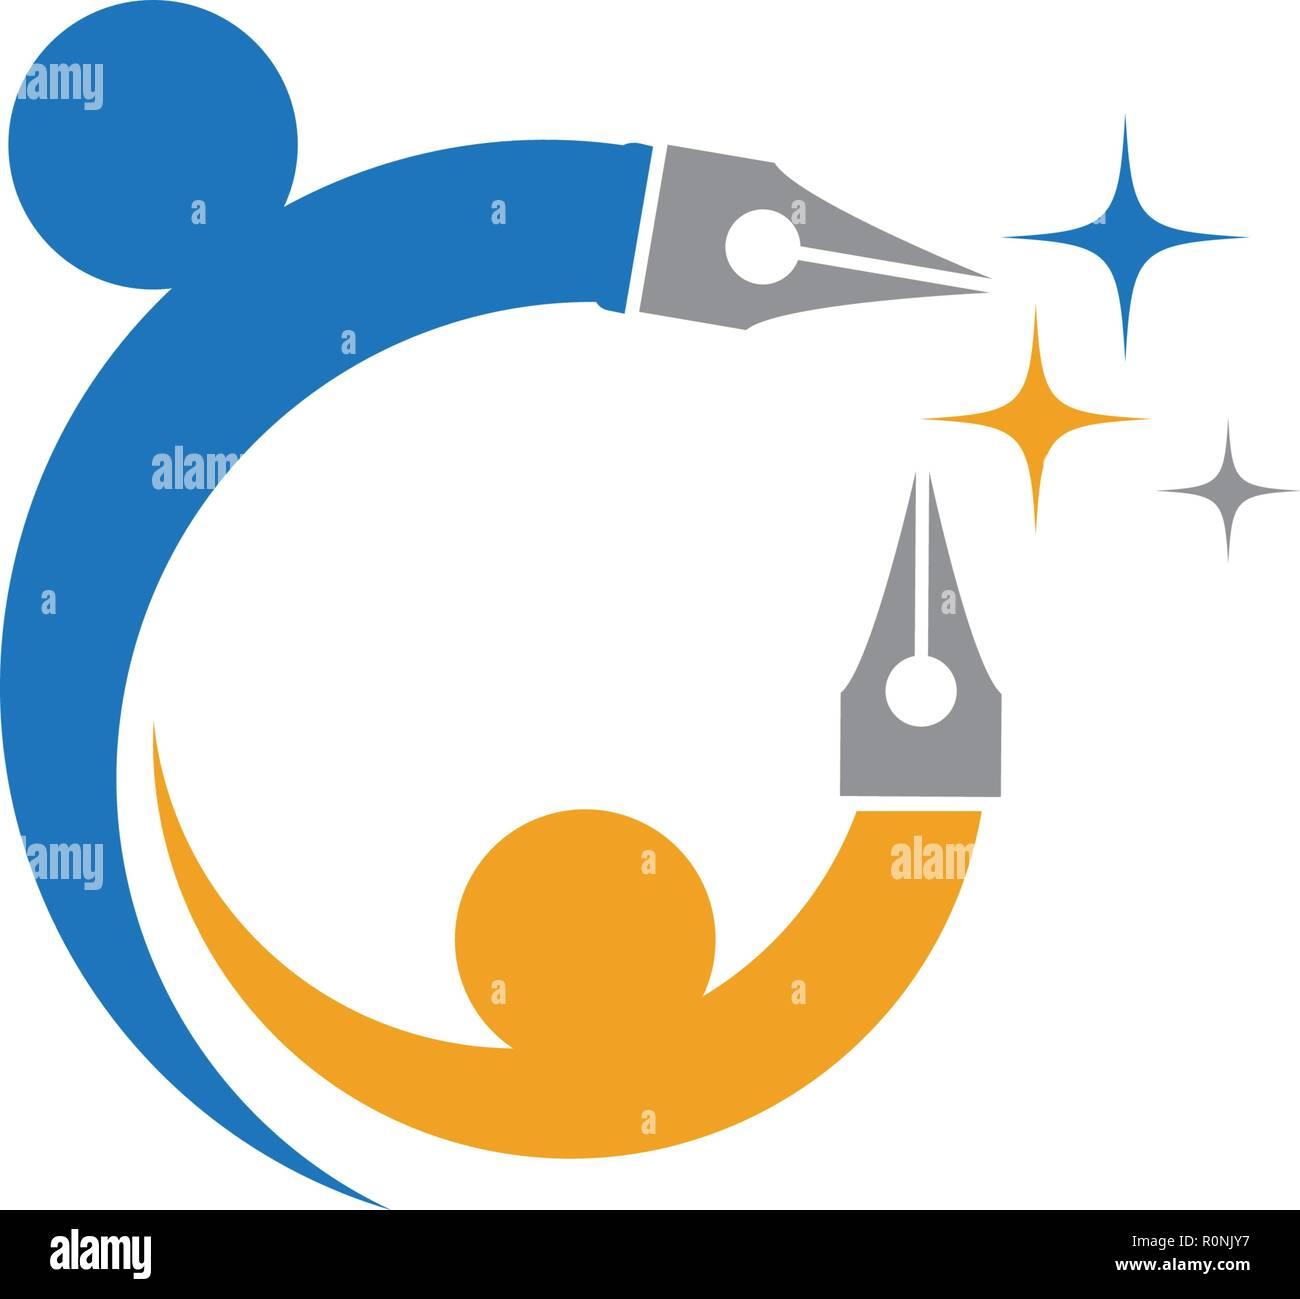 Education Logo Template vector icon design - Stock Image